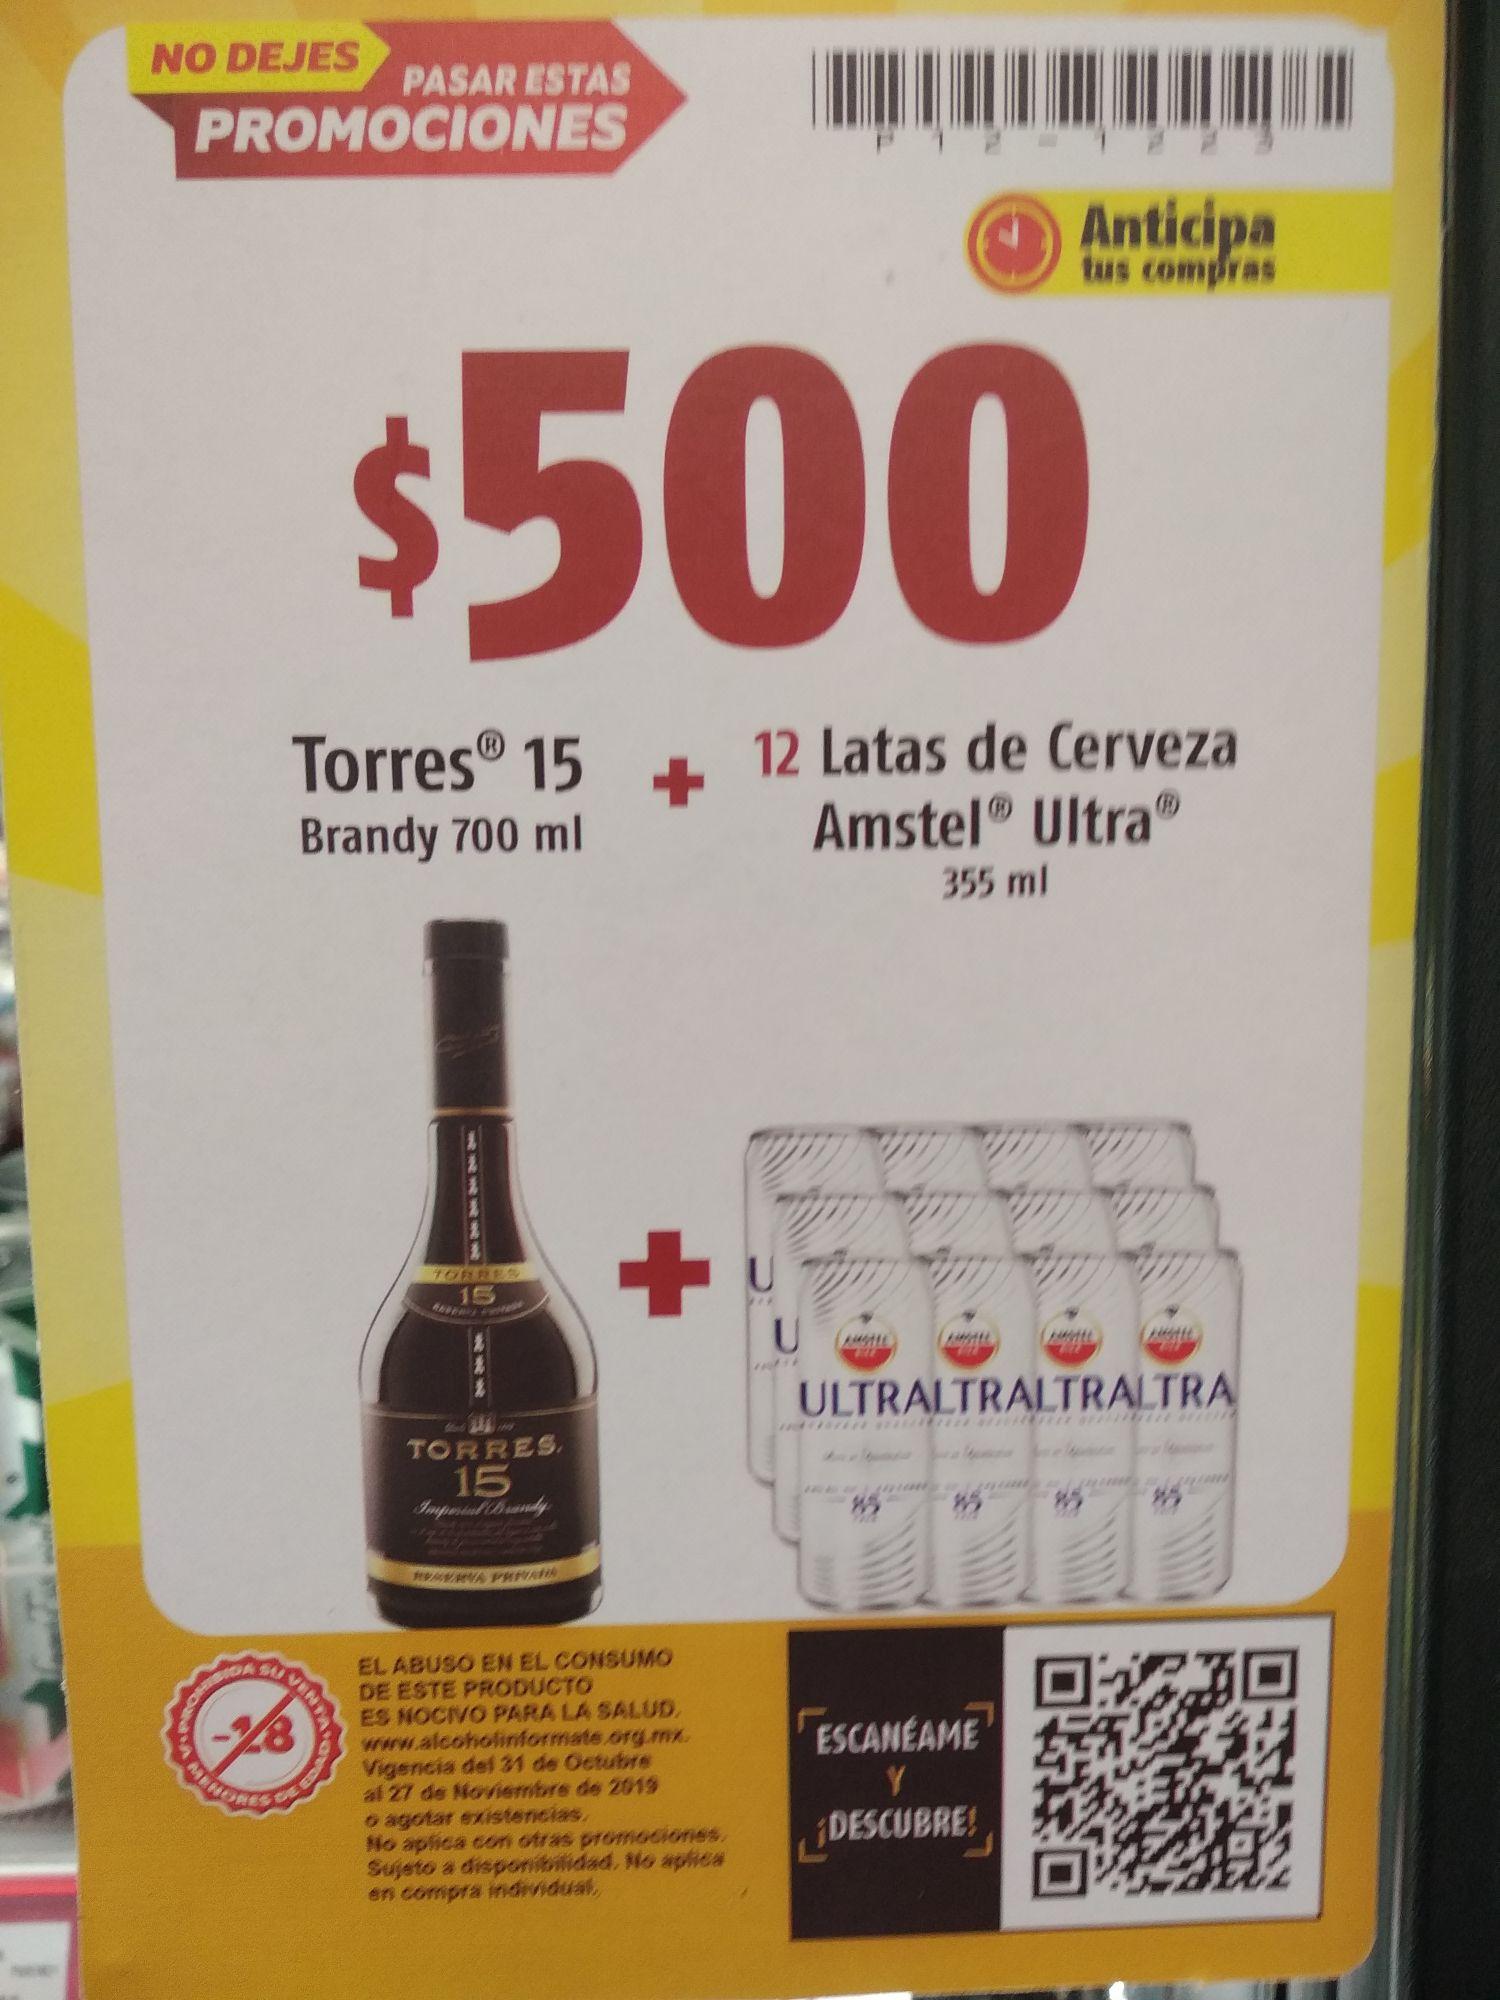 Oxxo: Brandy Torres 15 700 ml + 12 Amstel Ultra 395 ML c/u